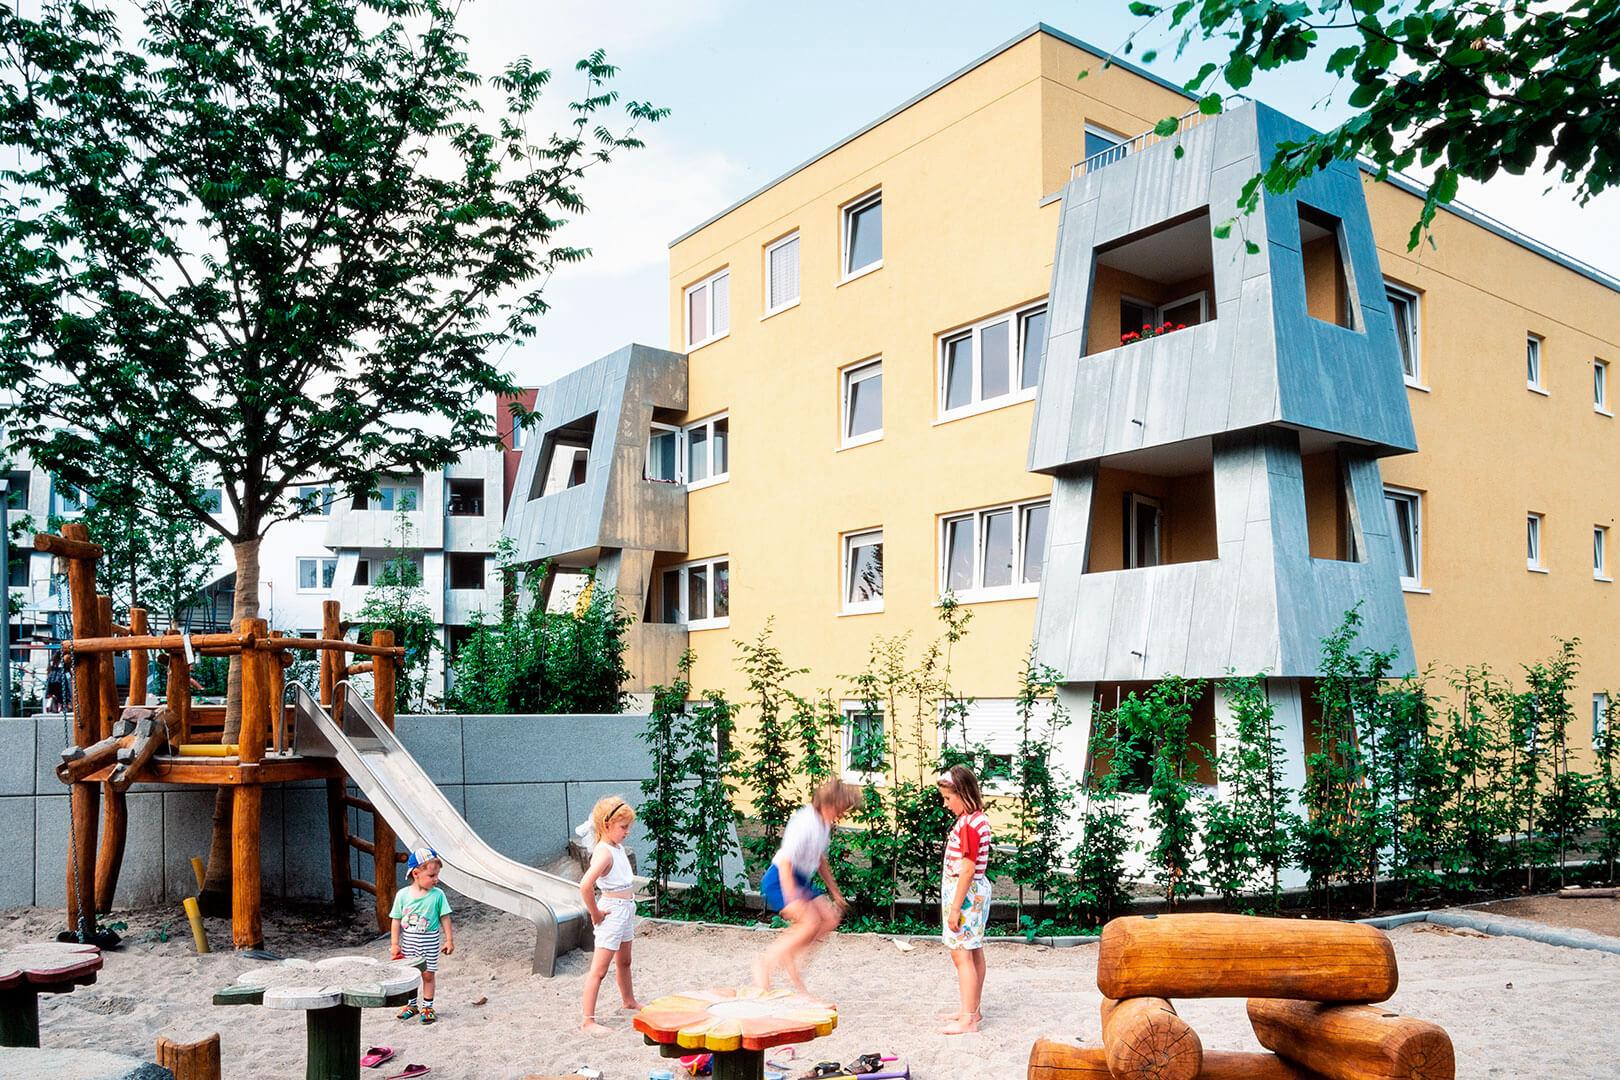 Goldsteinsiedlung, Frankfurt, Frank O. Gehry, New York Times Magazine